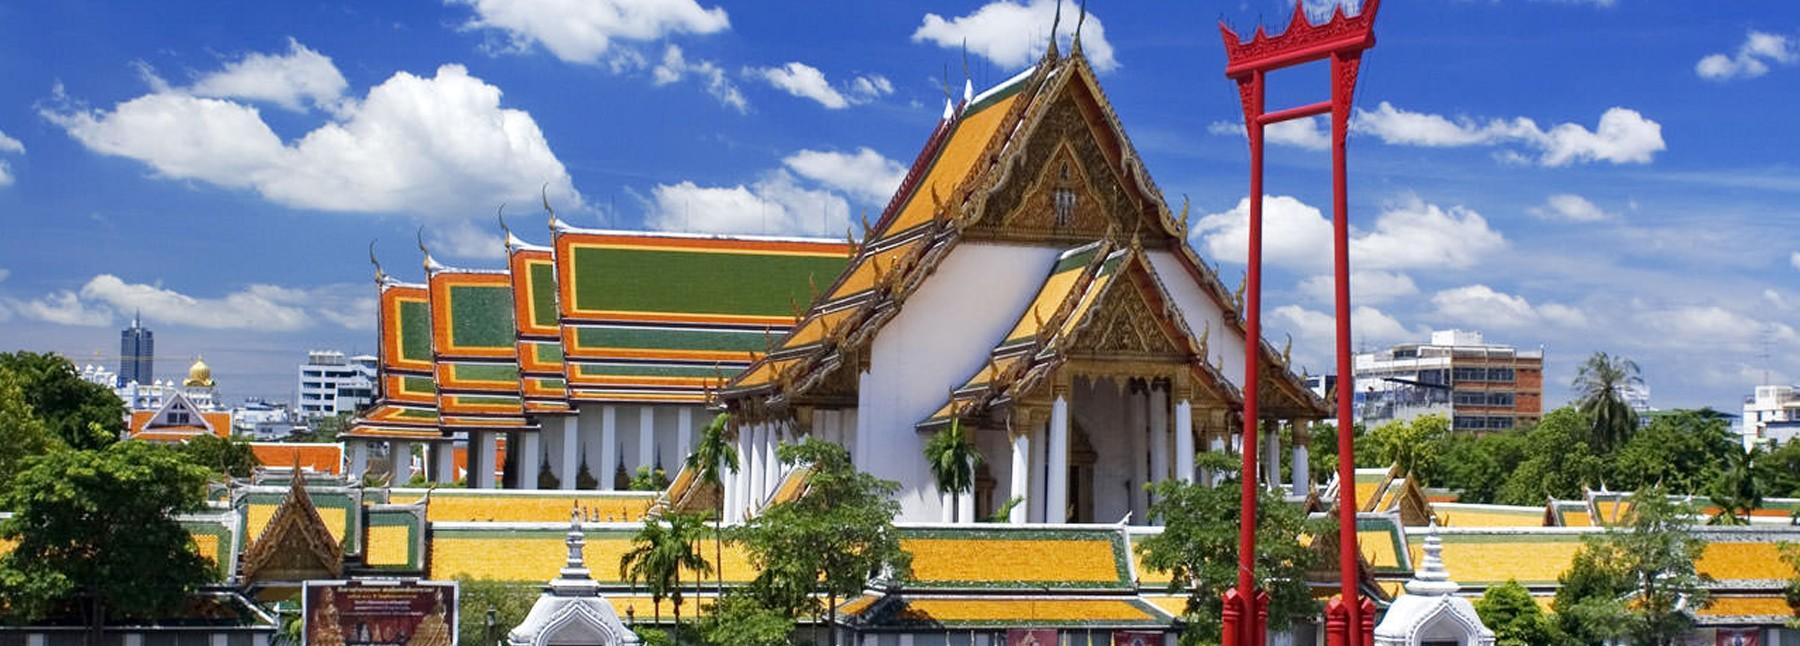 Wat Suthat  Novotel Bangkok Ploenchit